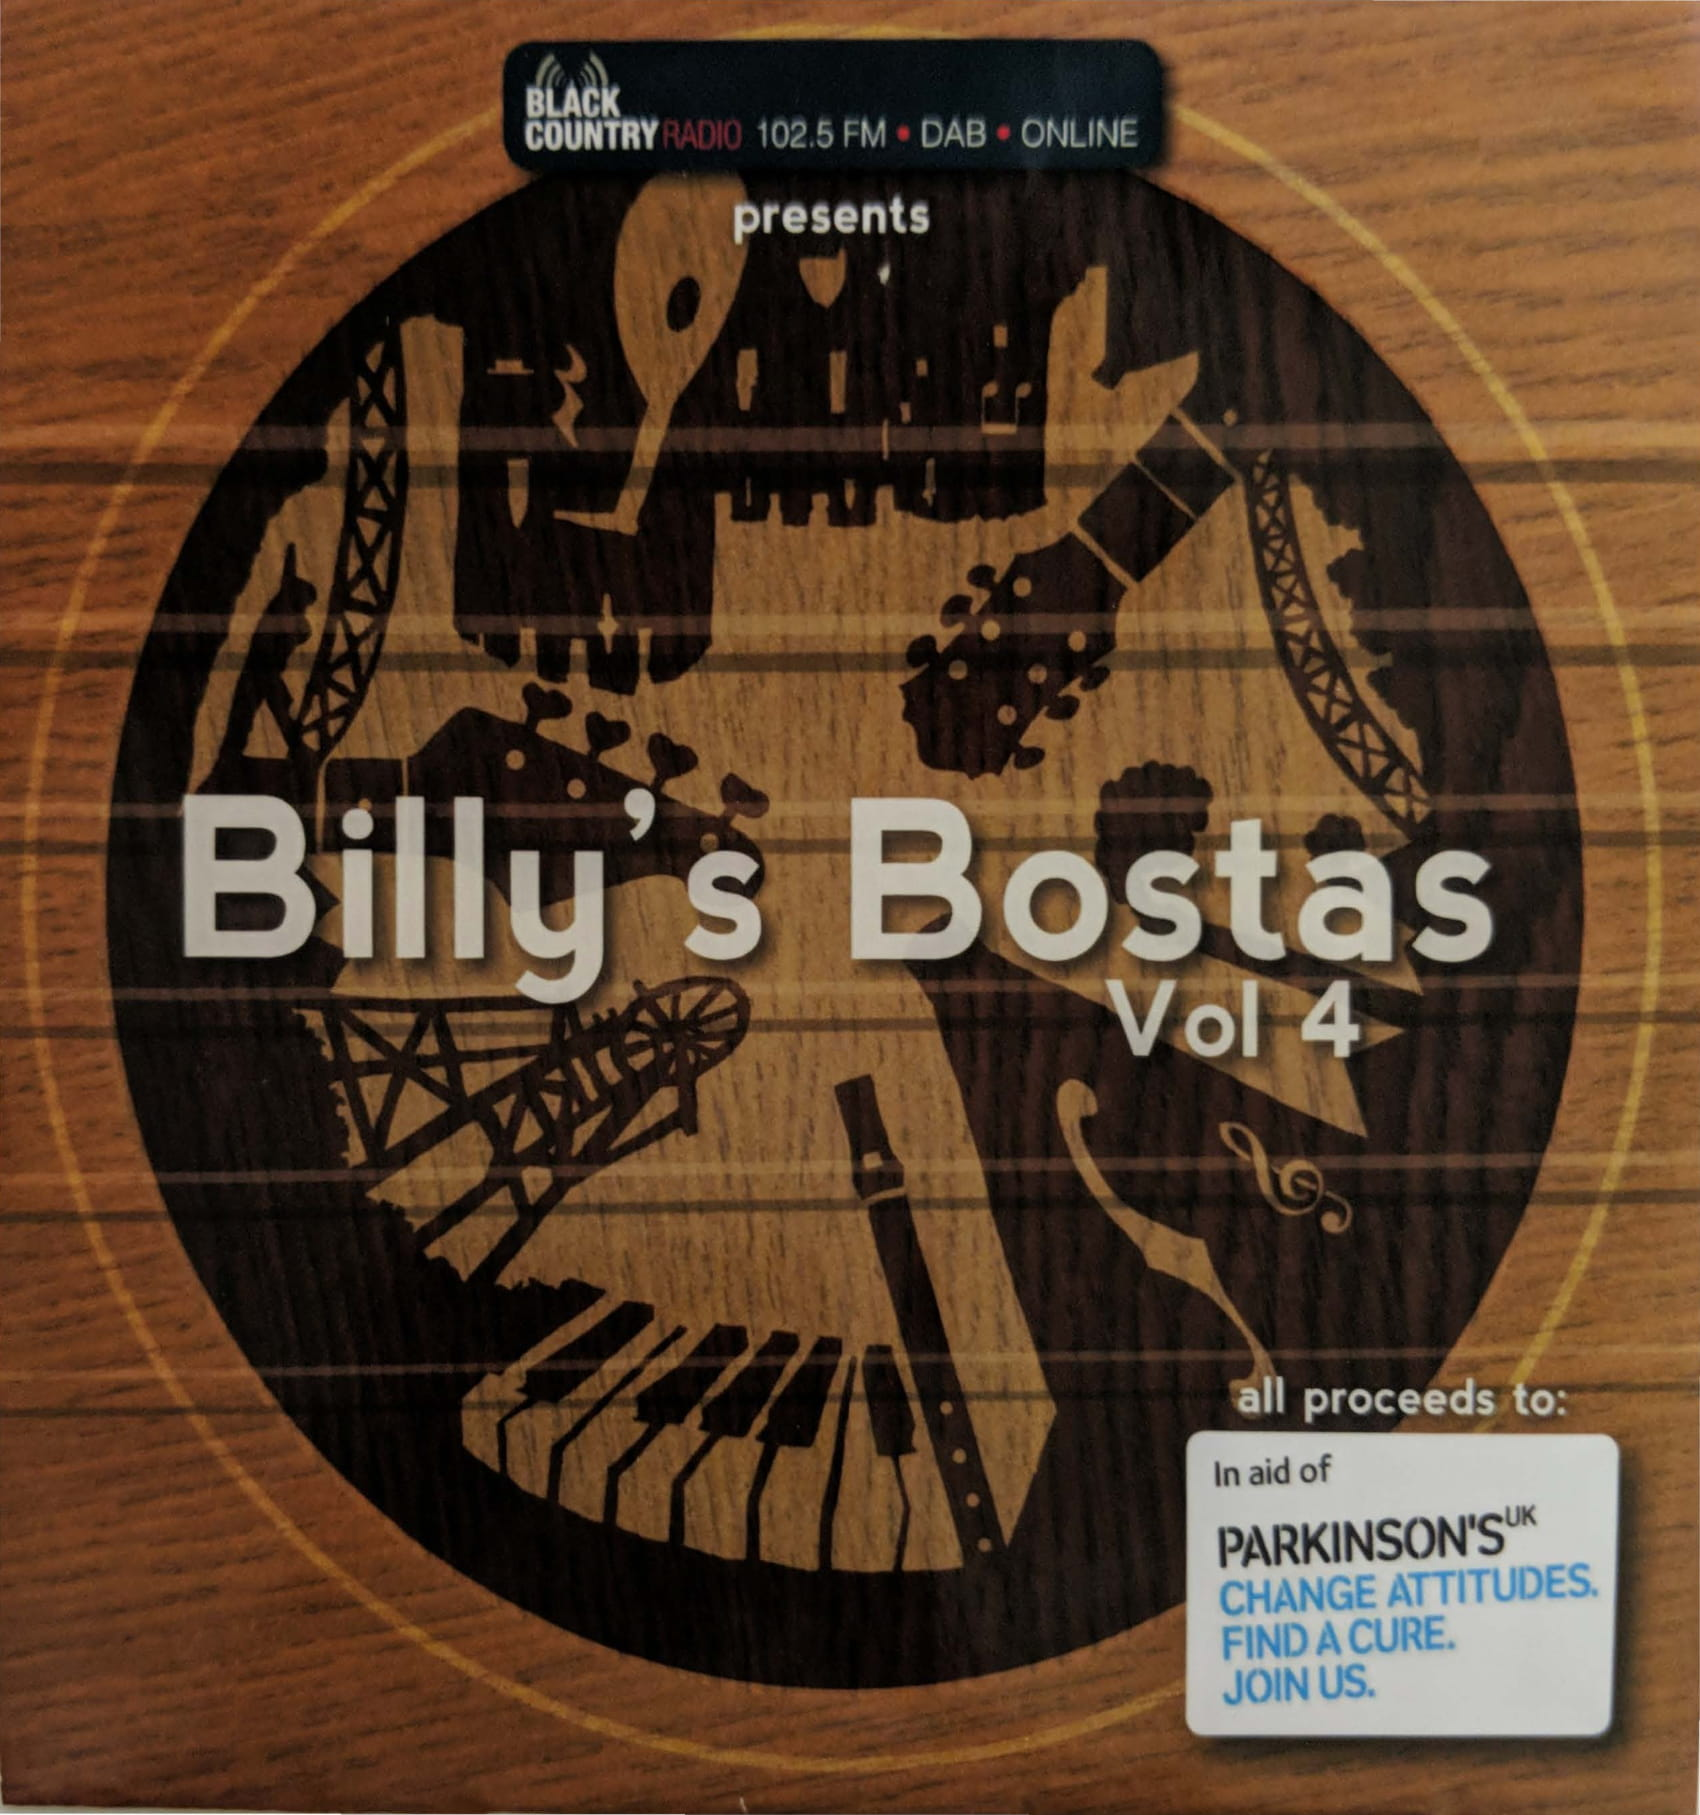 Billy's Bostas - Volume 4